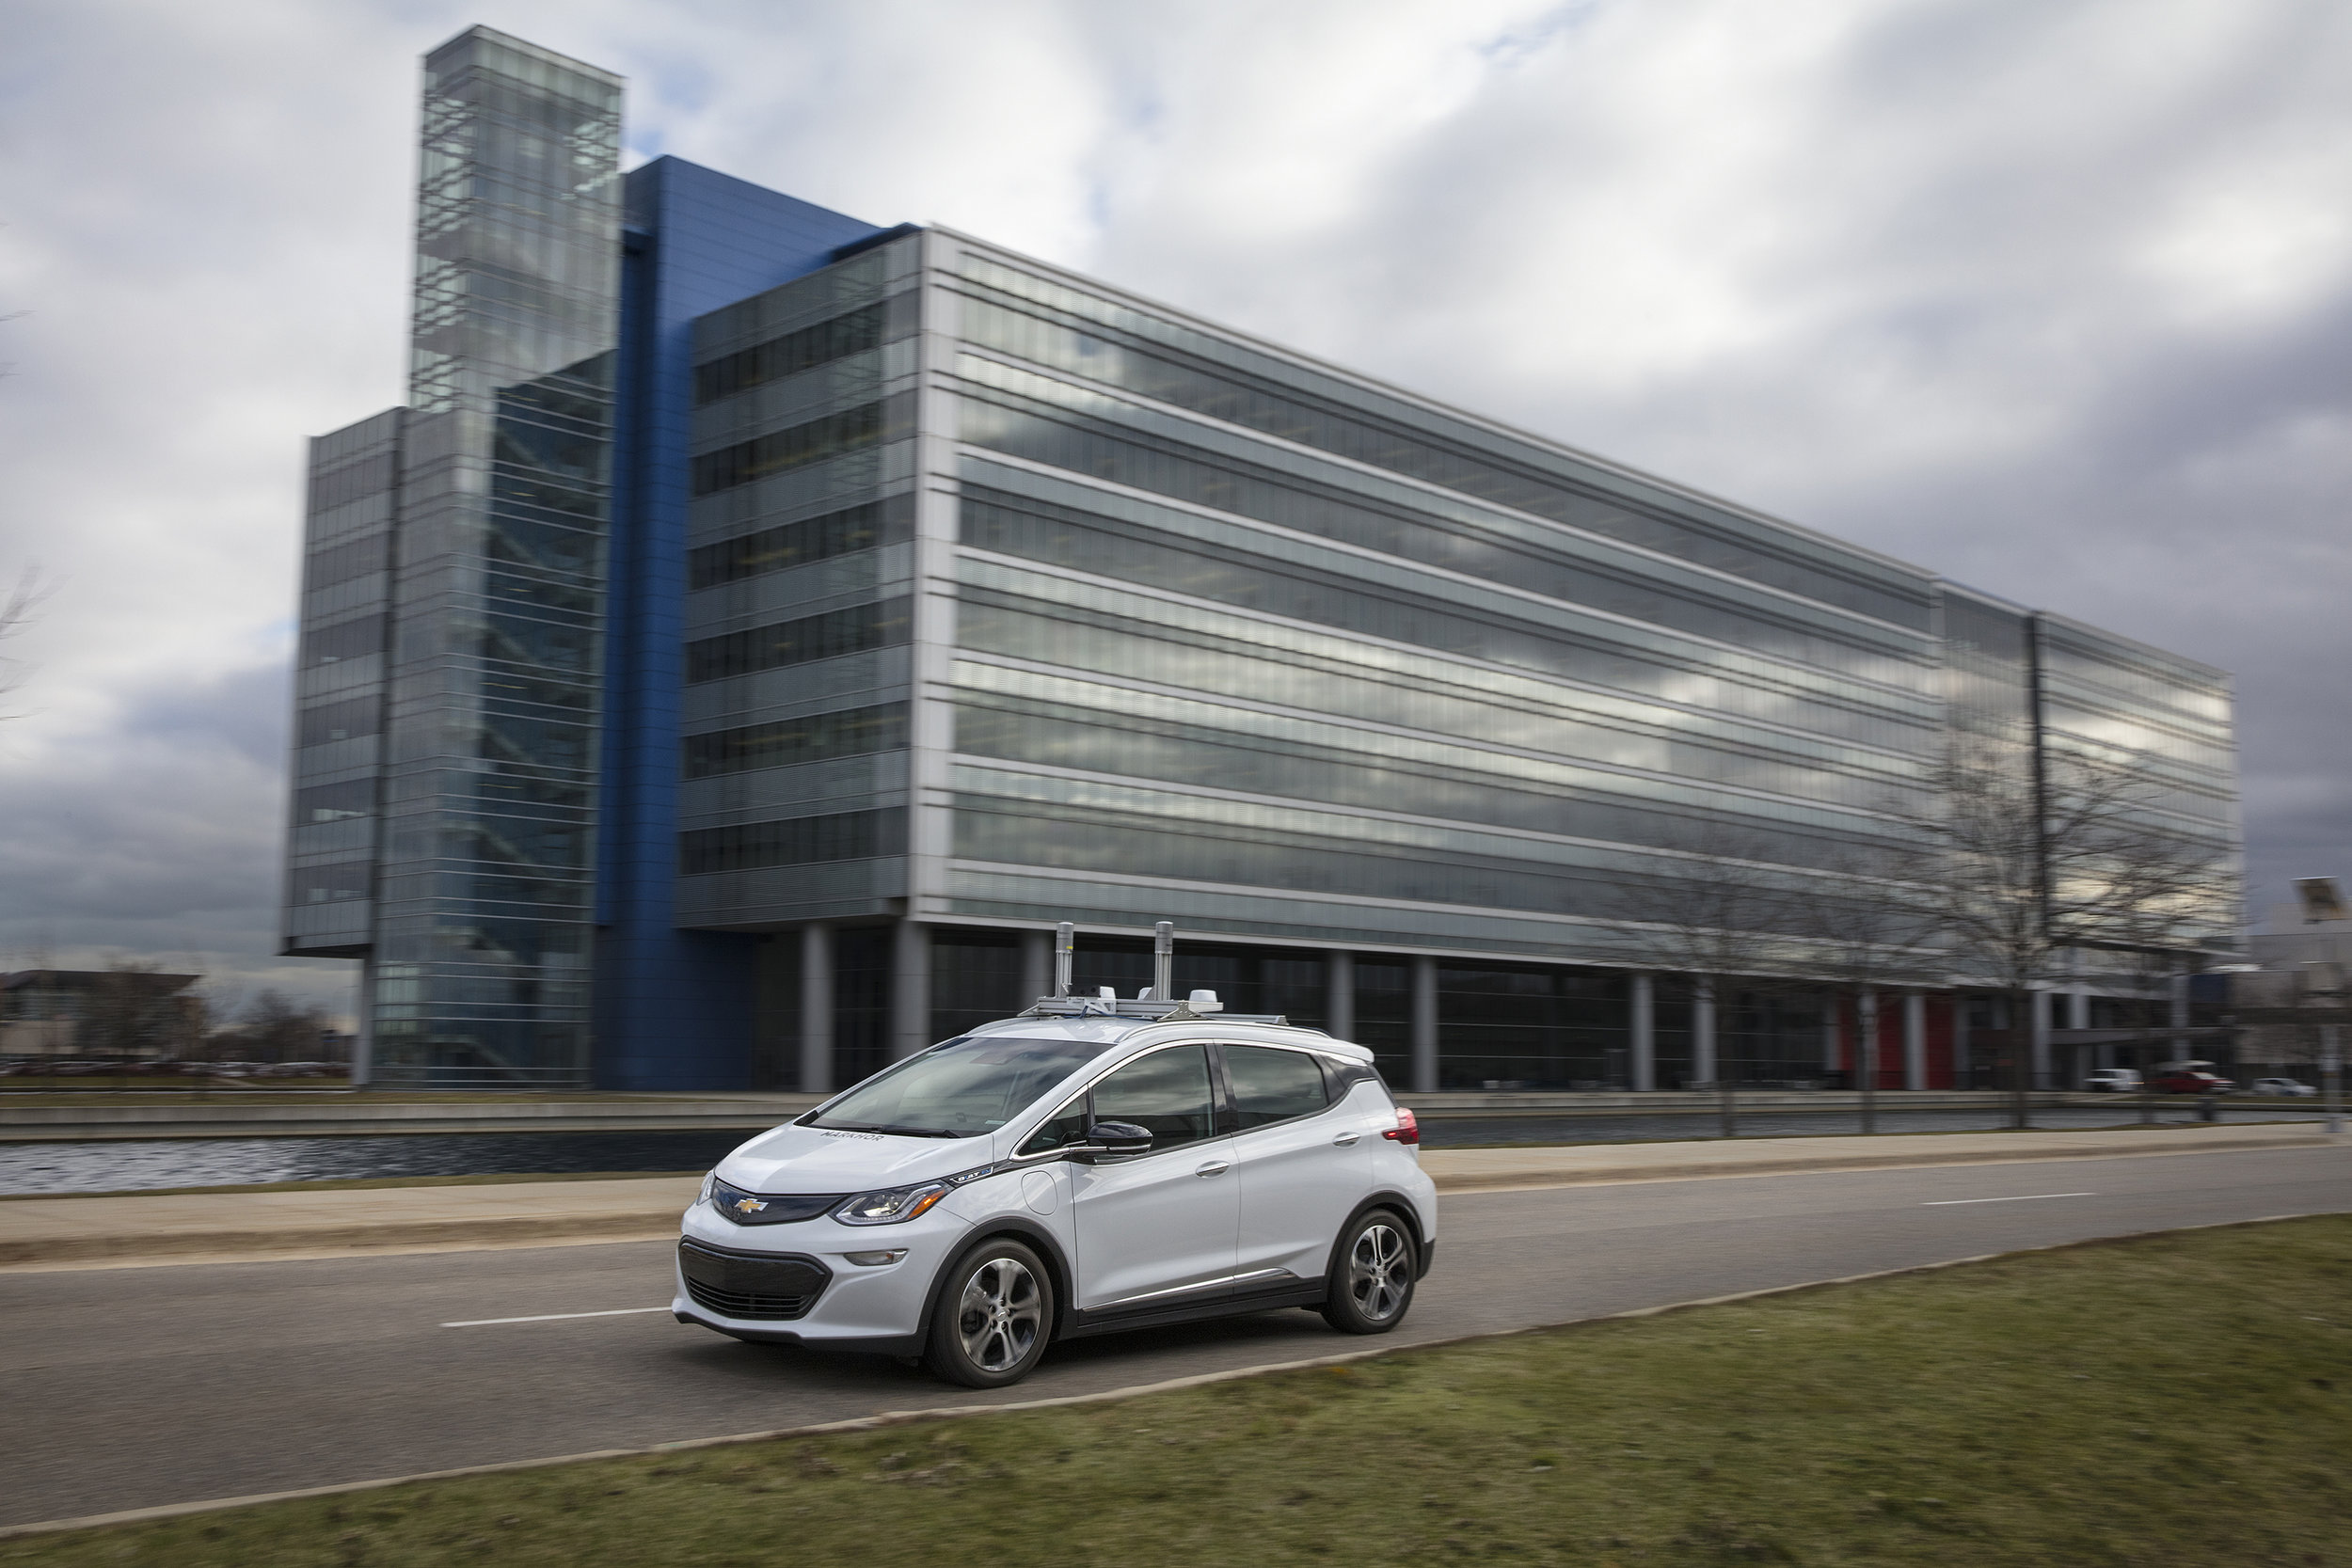 General Motors has begun testing fully autonomous development fleet vehicles on public roads in Michigan, starting with roads nearby its Technical Center in Warren.